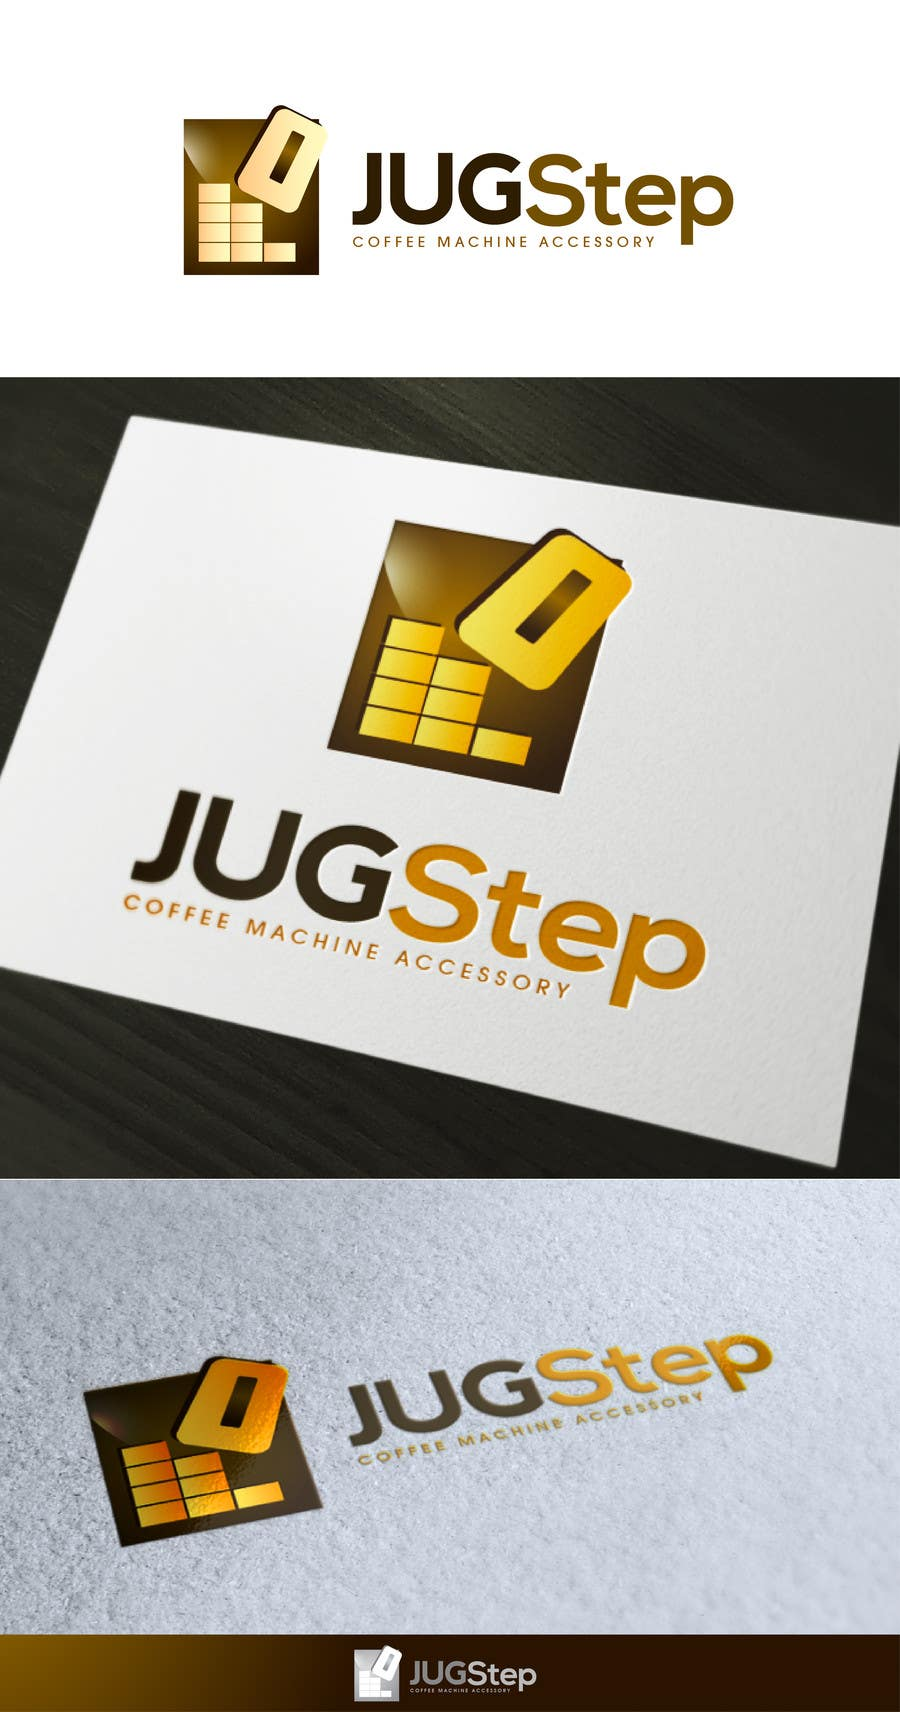 Bài tham dự cuộc thi #                                        12                                      cho                                         Design a Logo for new silicone coffee machine accessory